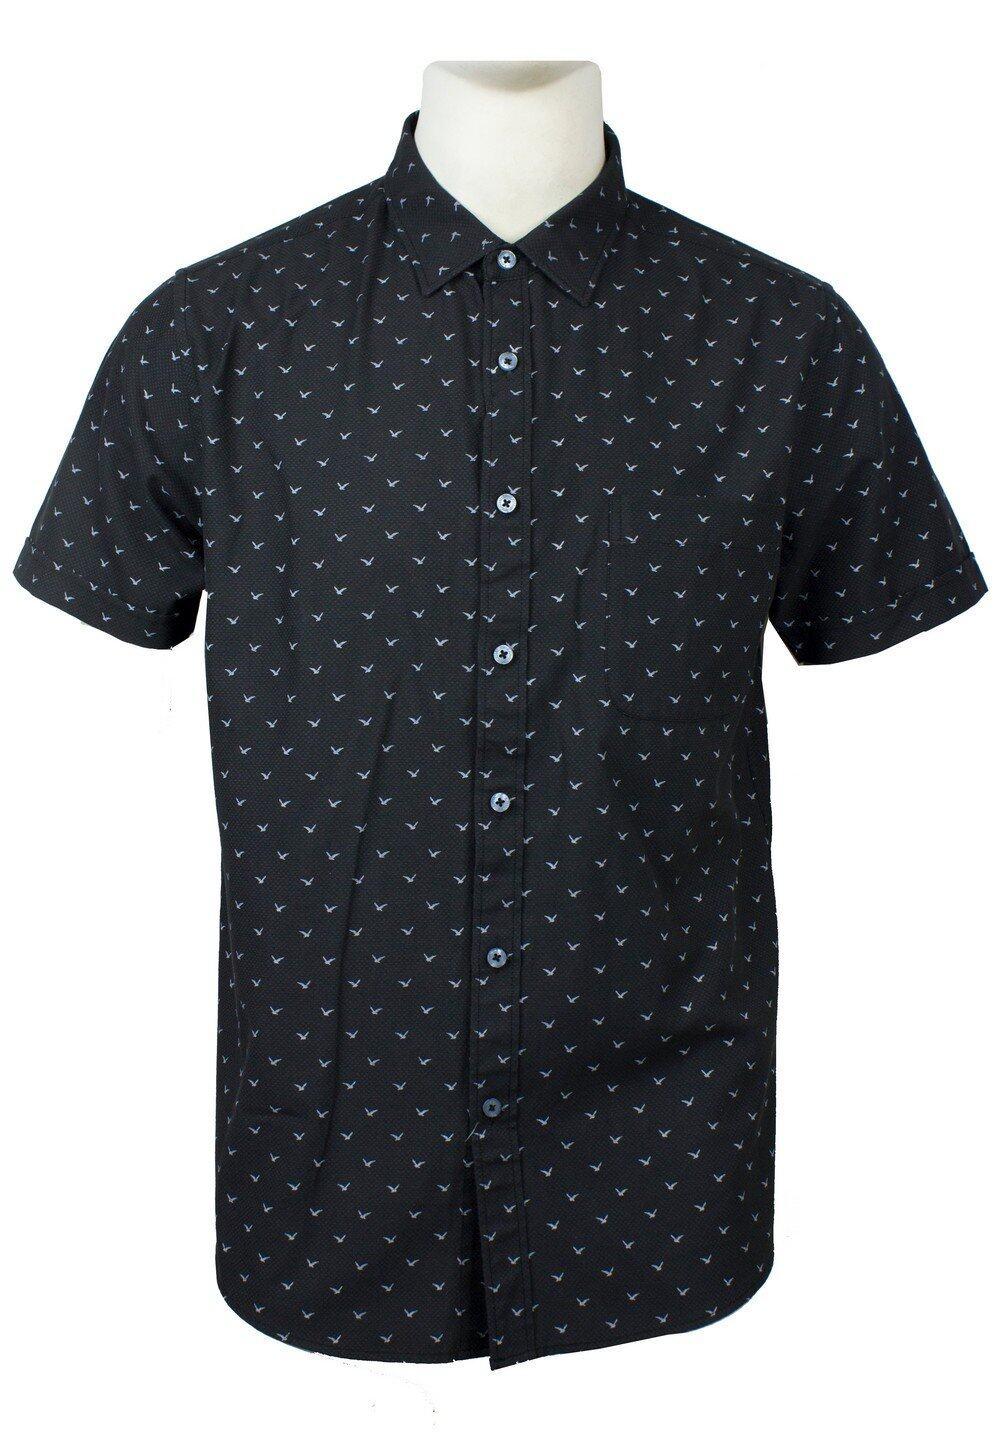 Men's Printed Short Sleeve Shirt 848